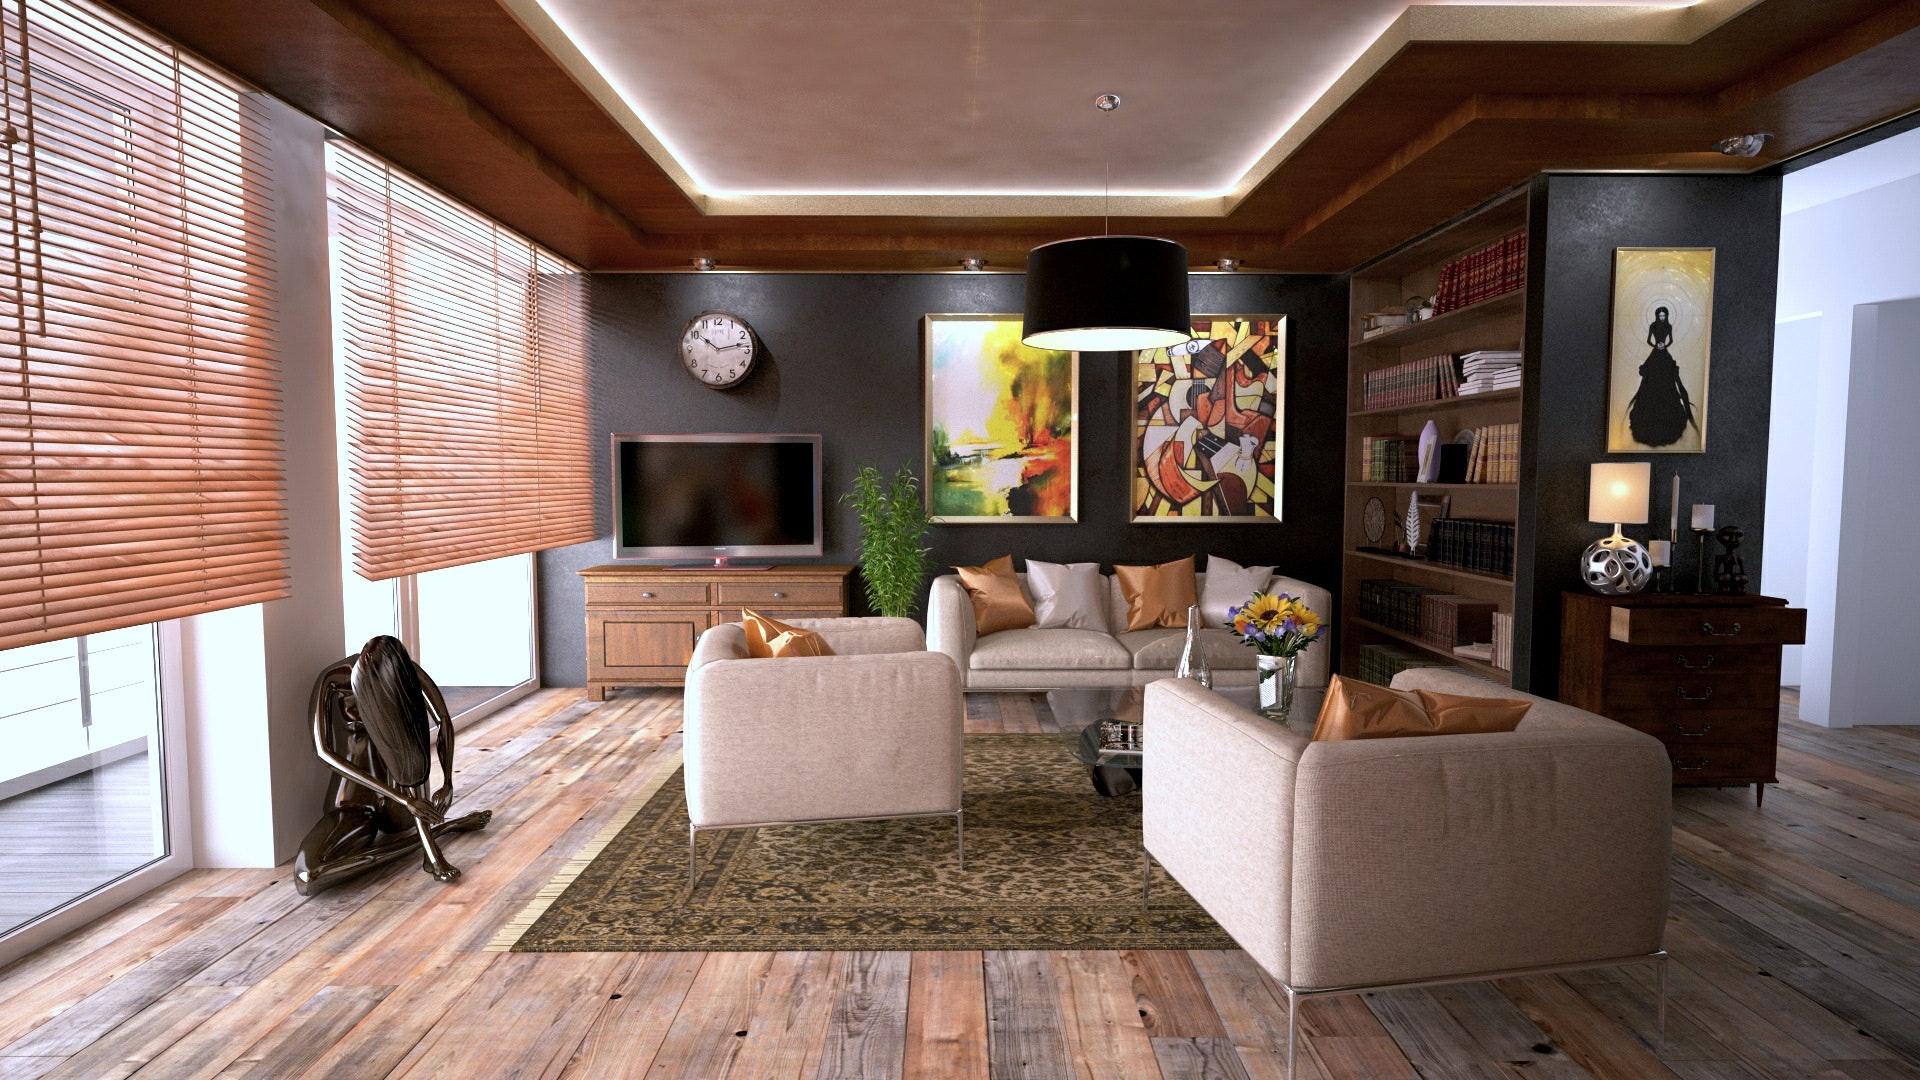 Apartment for shor-term rentals